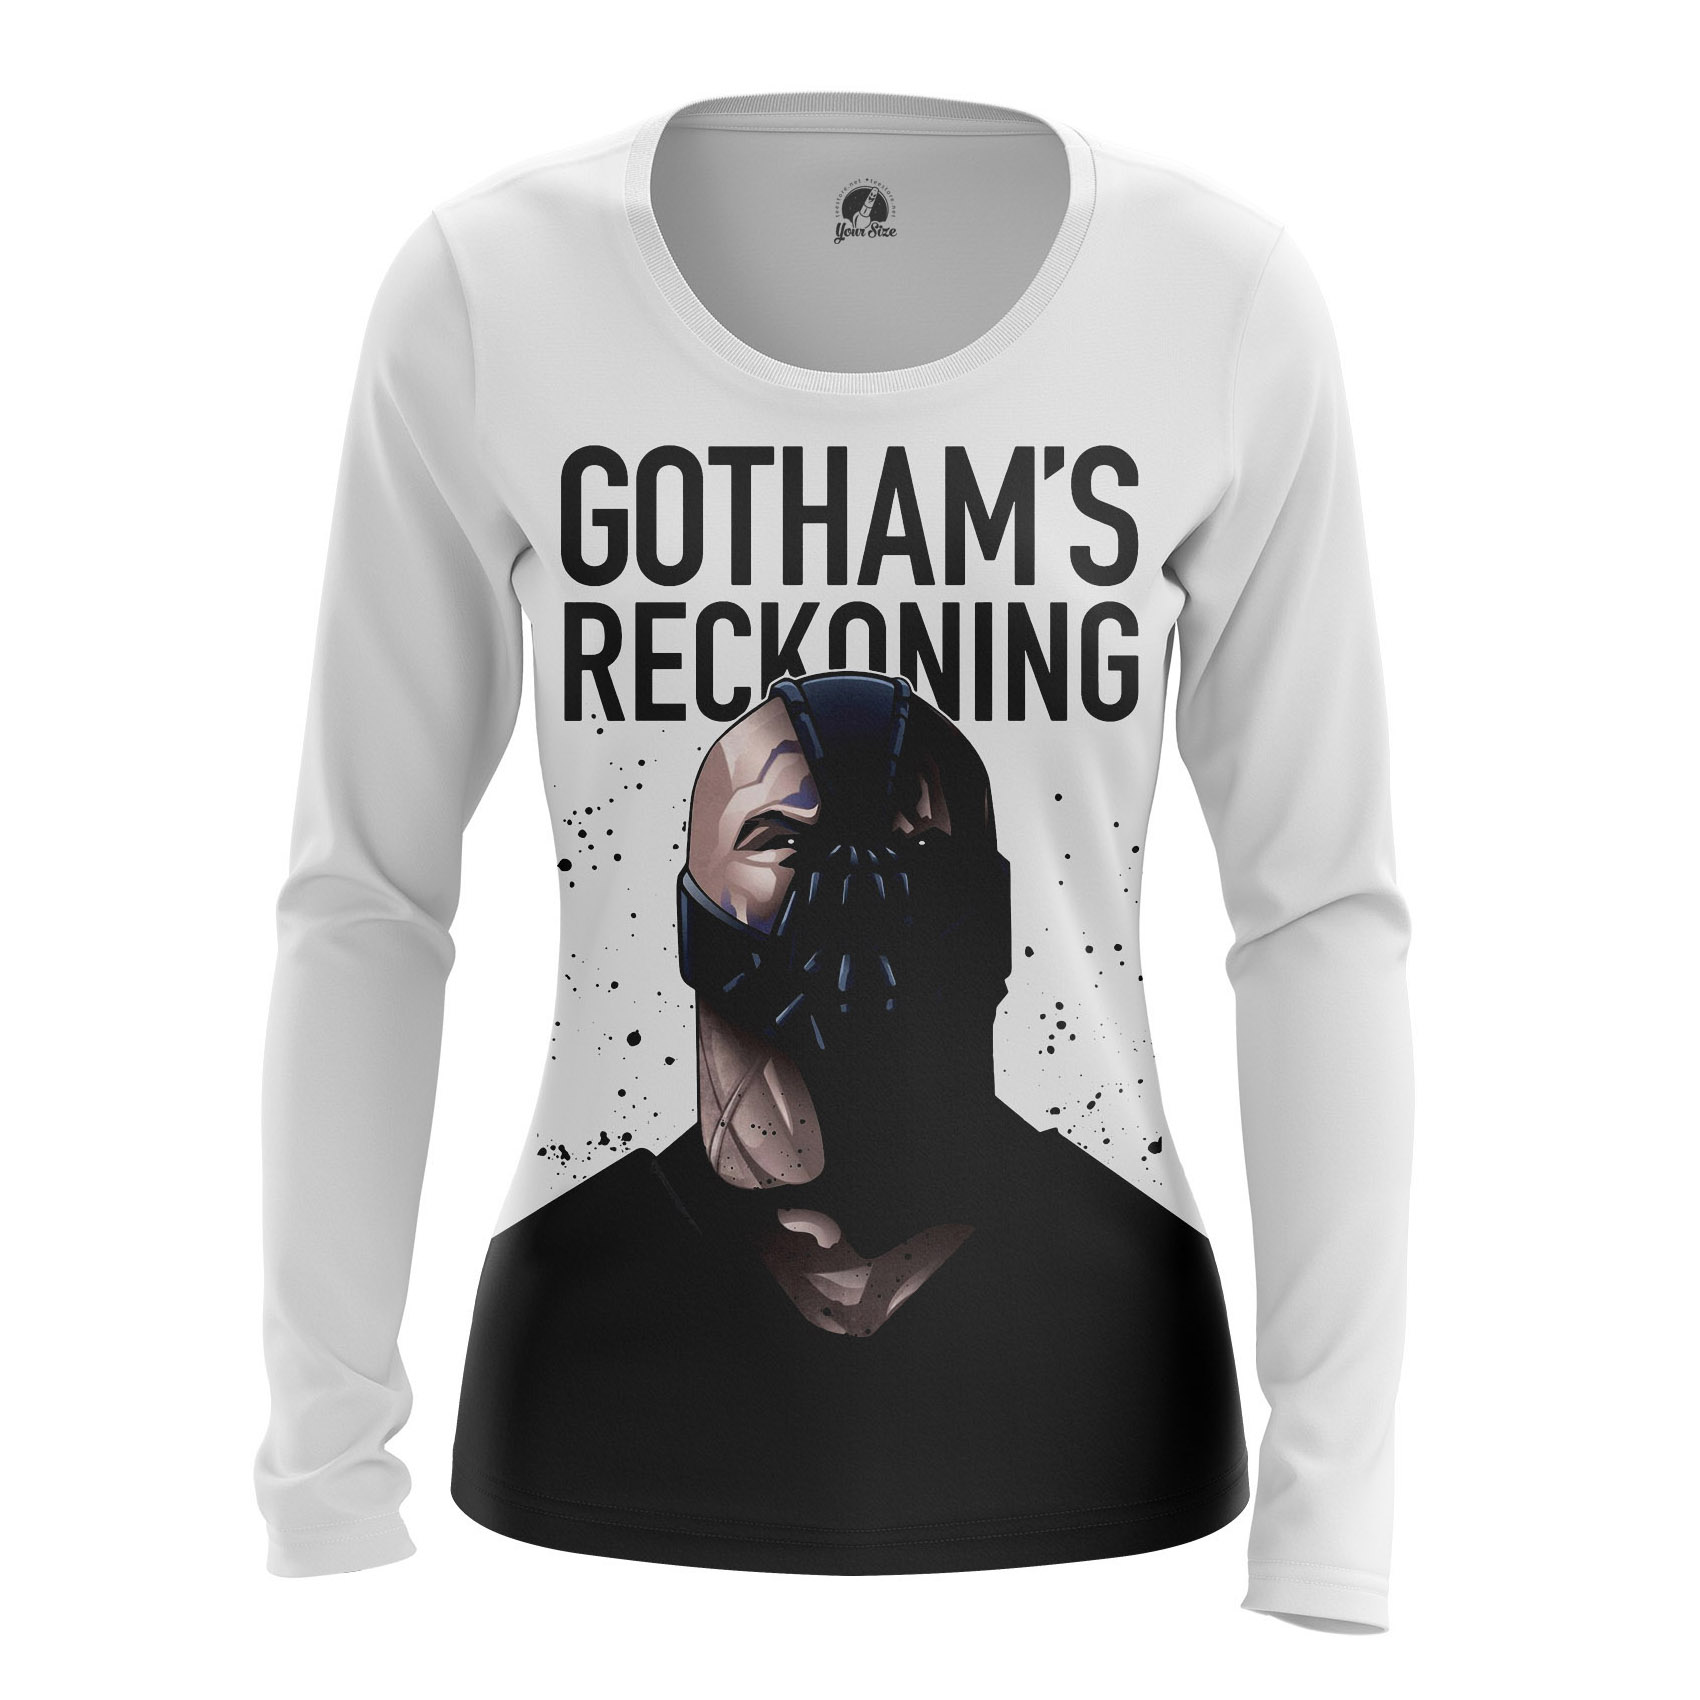 Collectibles Women'S Raglan Gothams Reckoning Bane